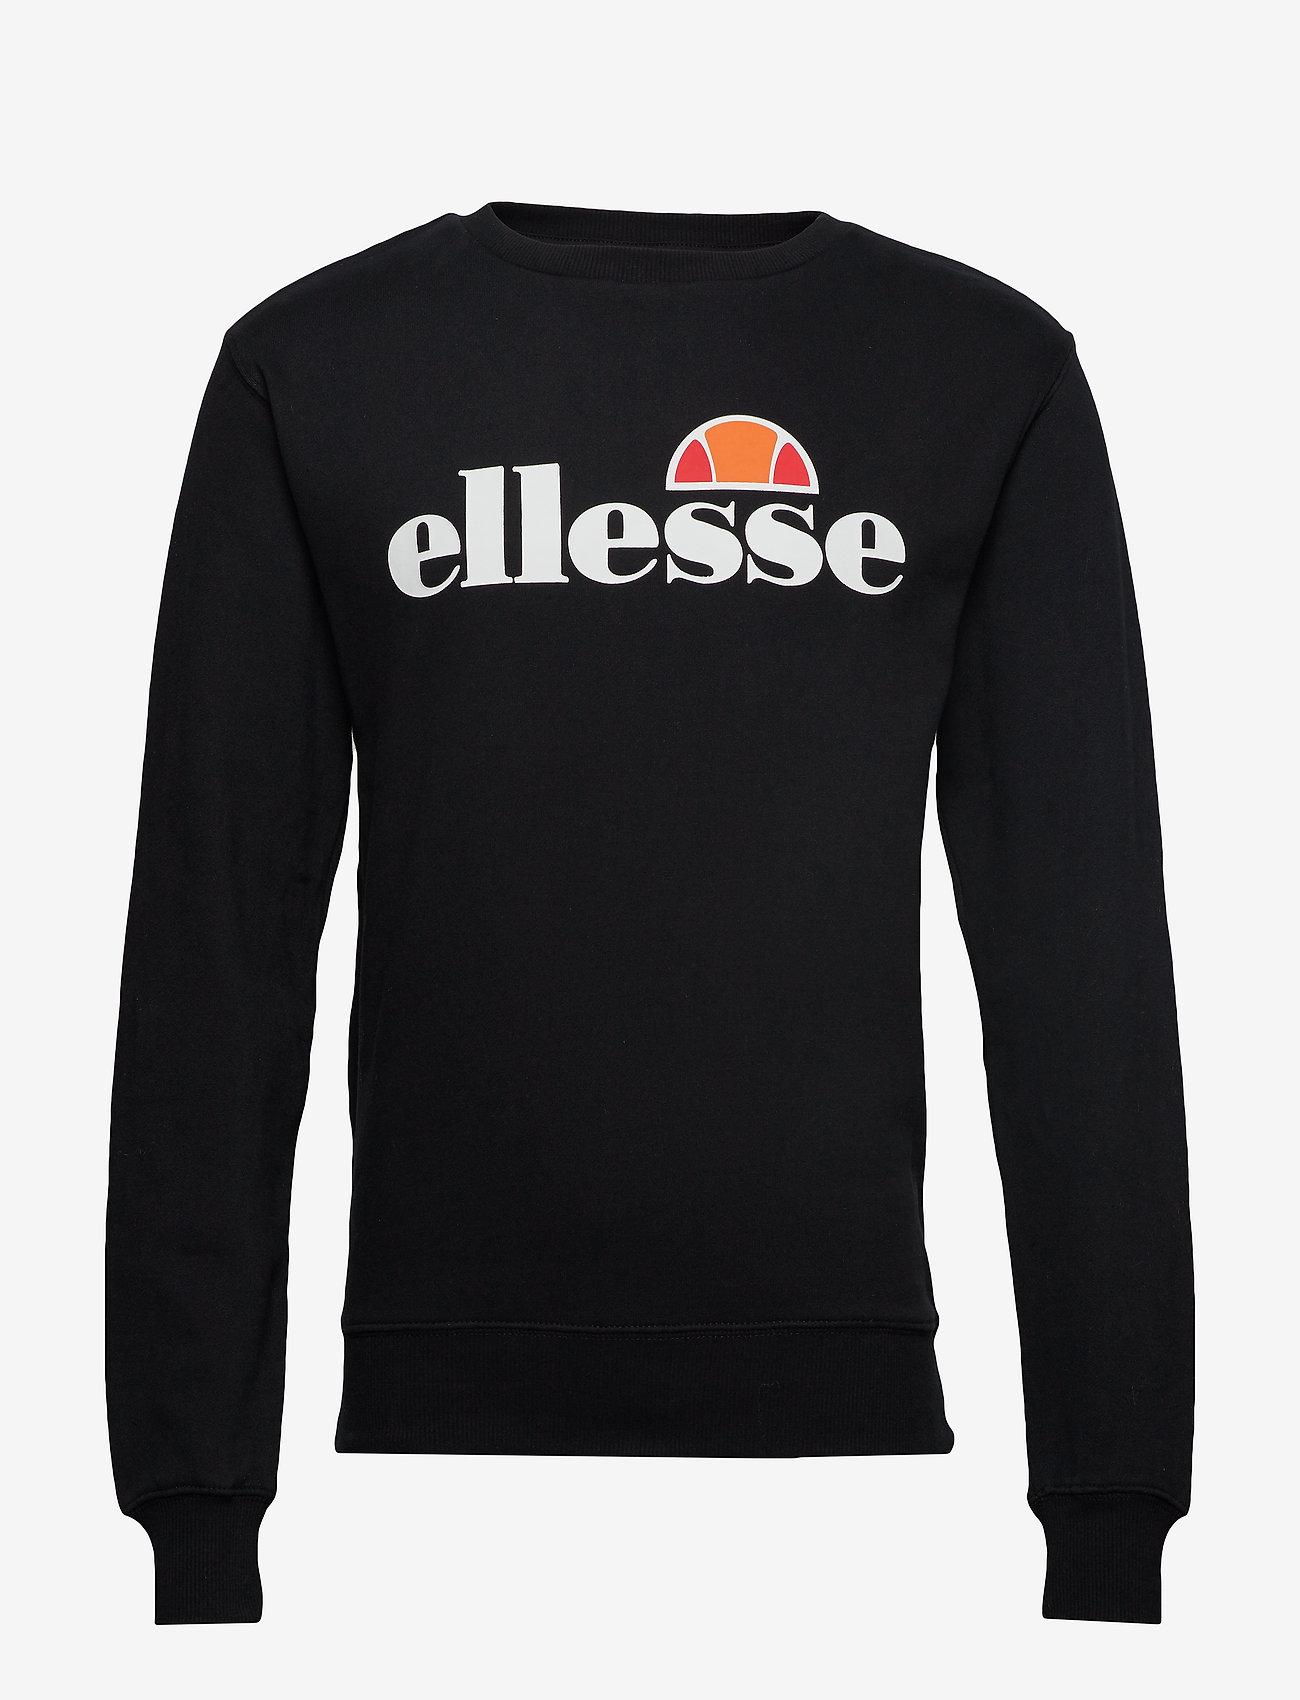 Ellesse - EL AGATA - sweatshirts - anthracite - 0